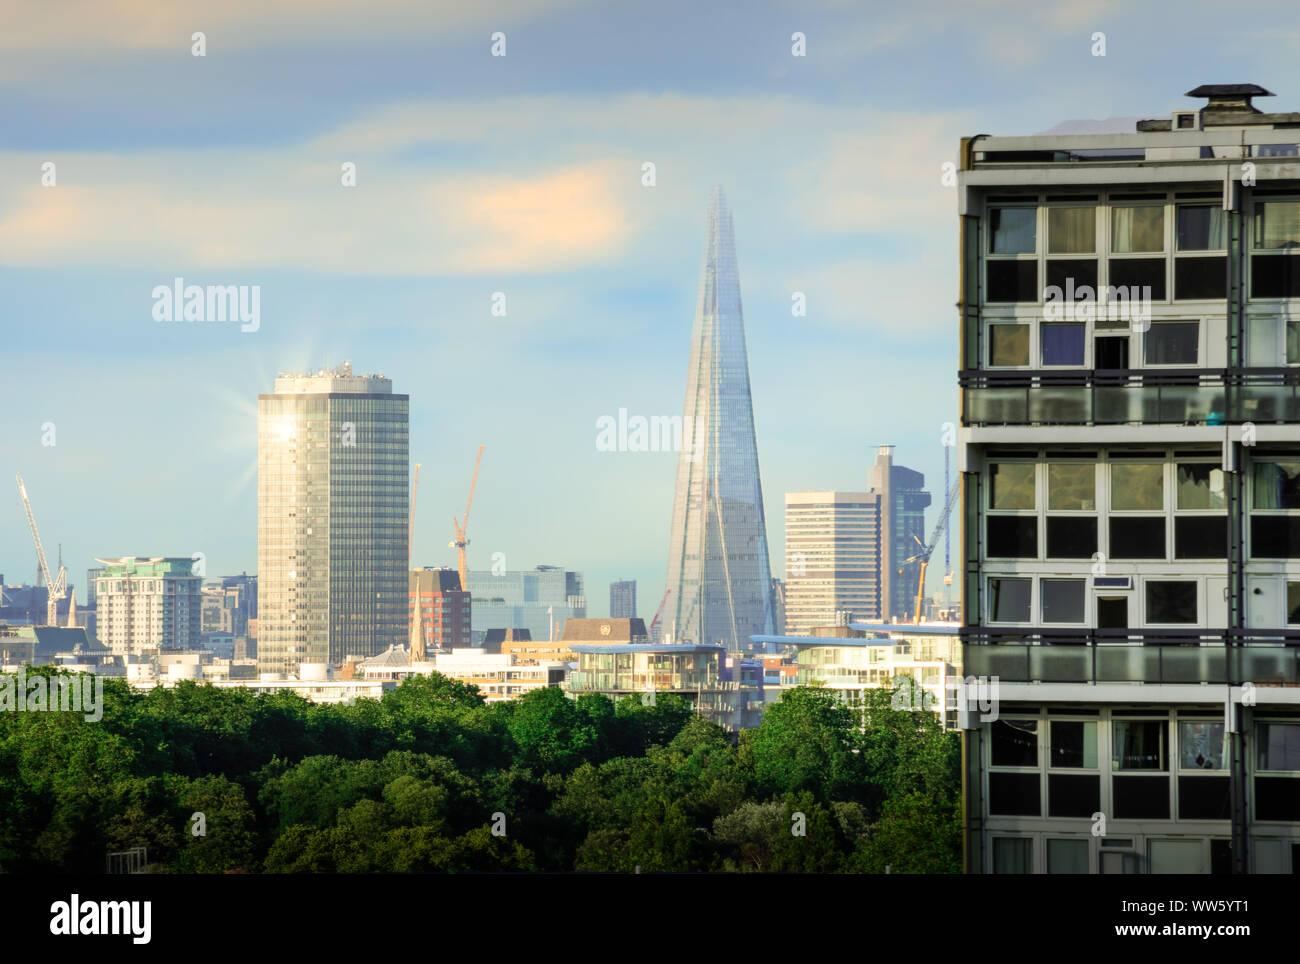 Rich meets poor. London skyline from Battersea Stock Photo